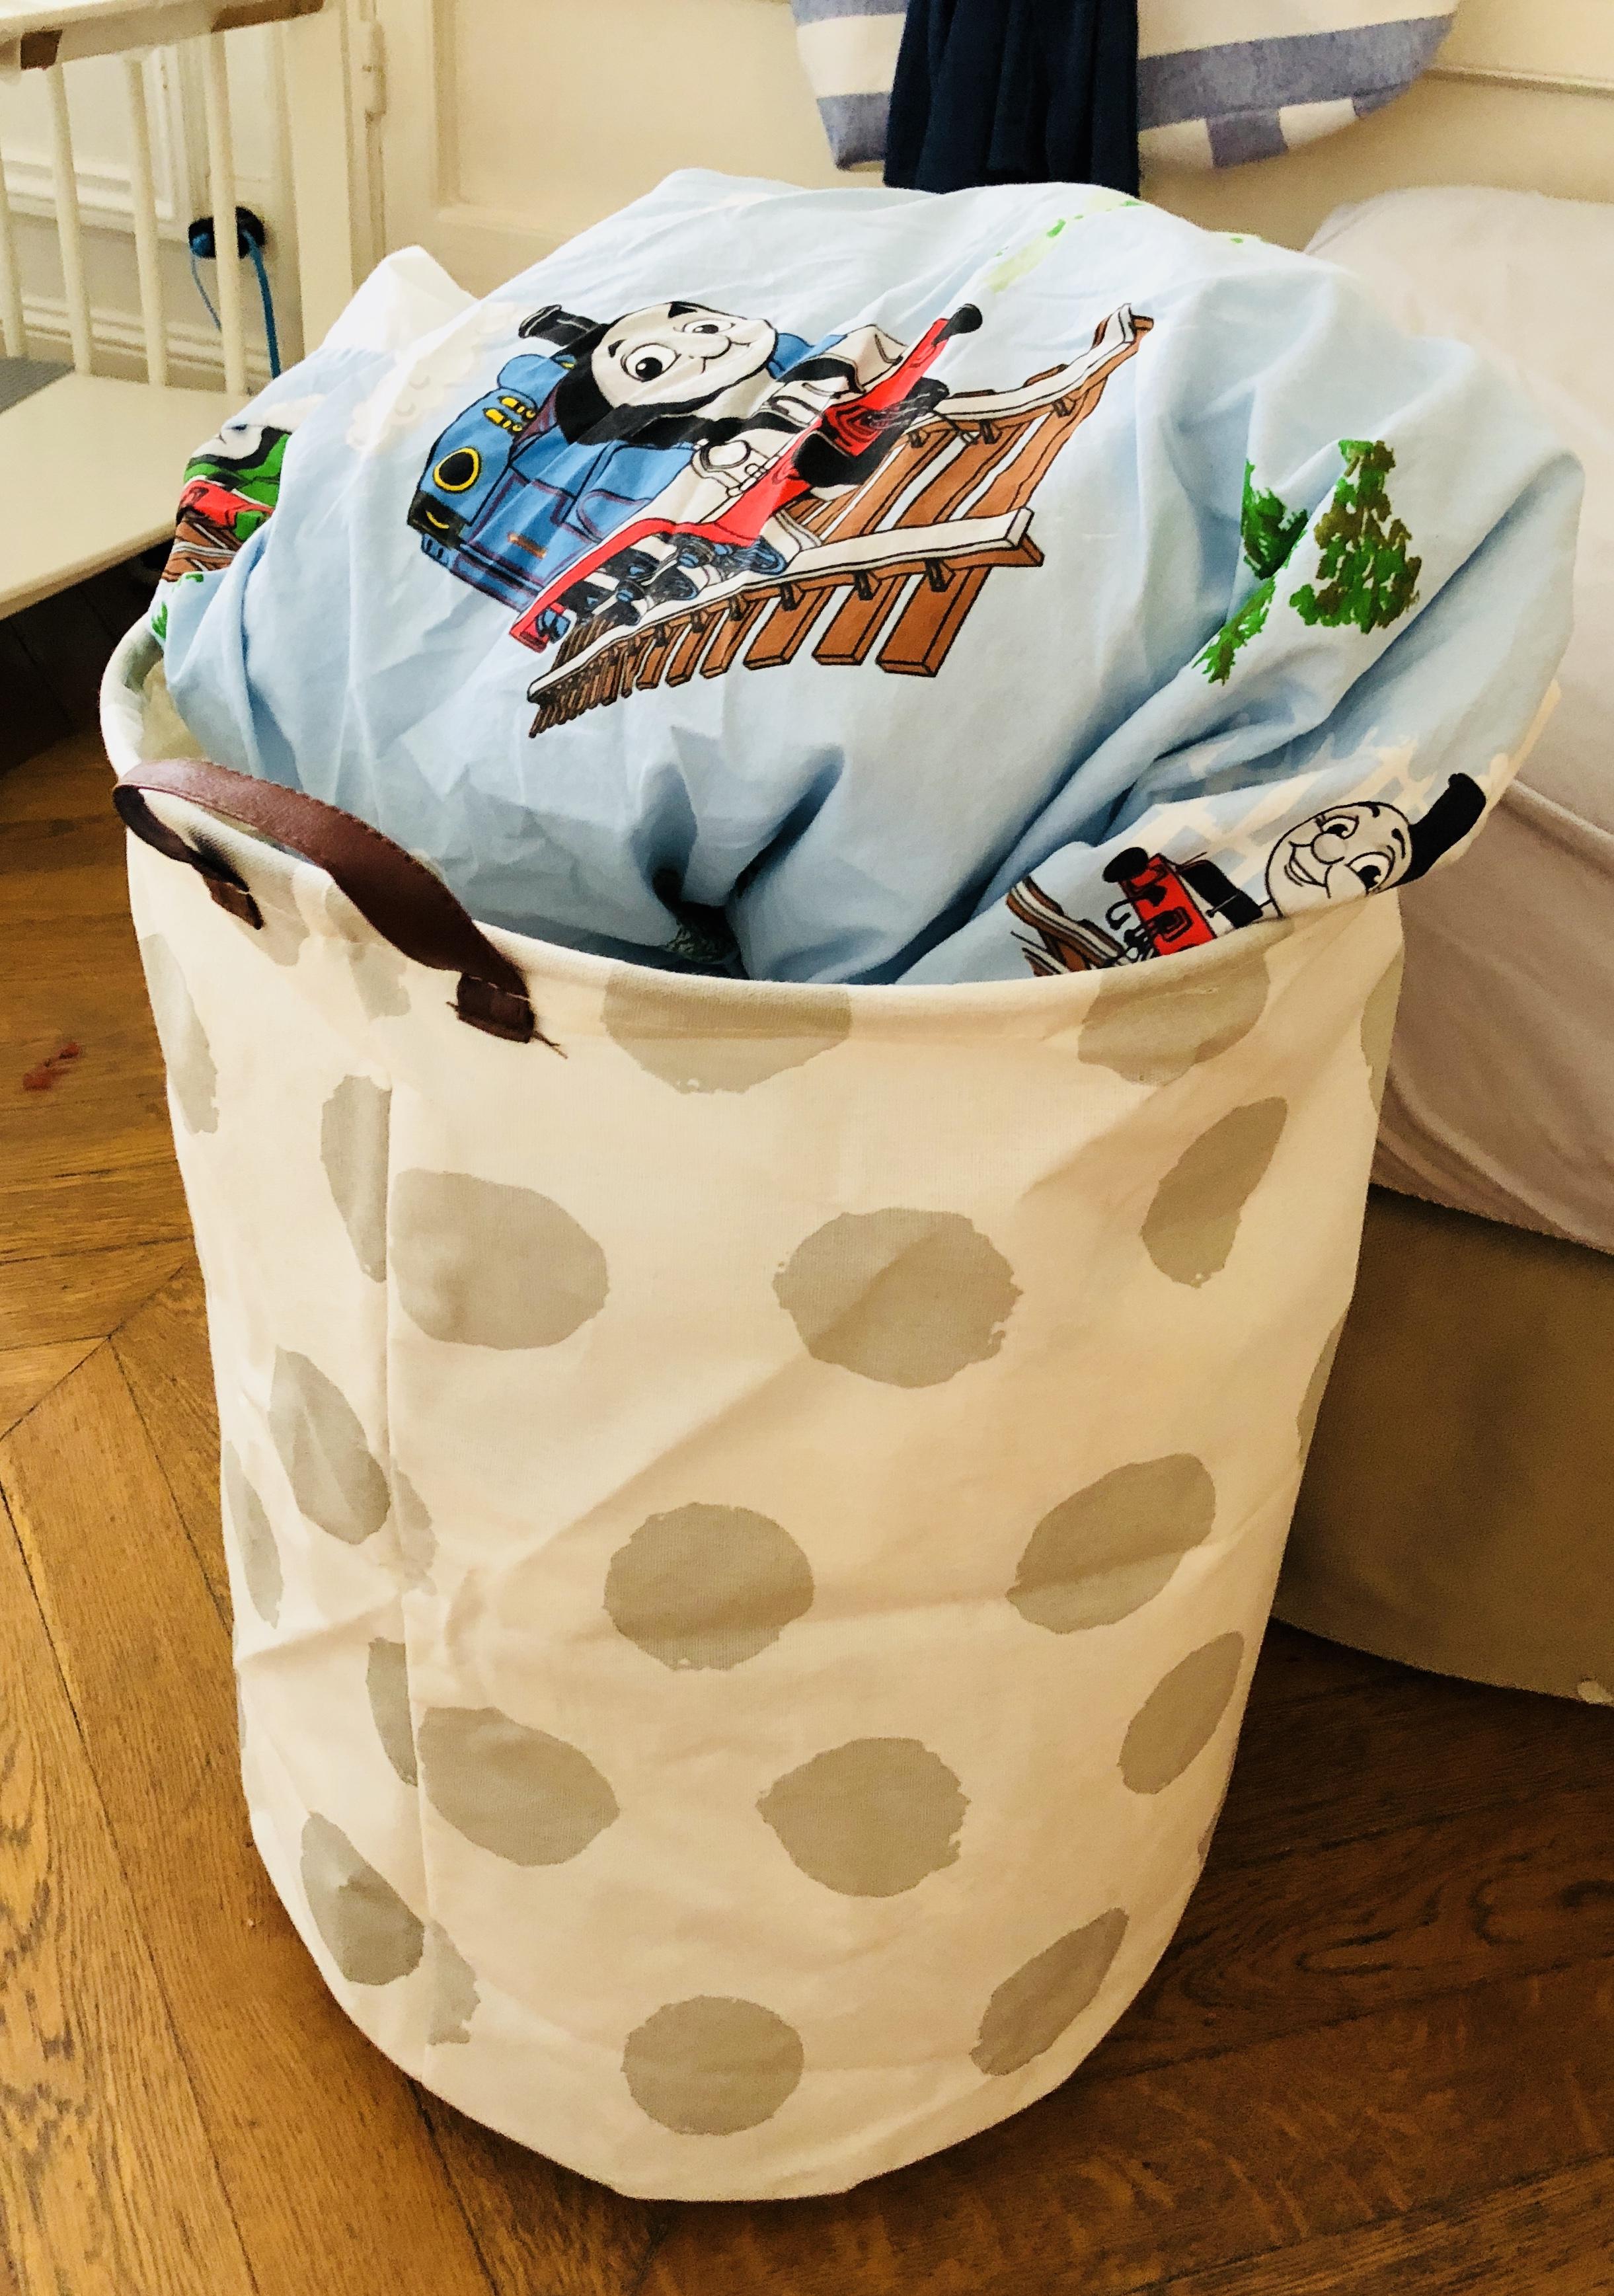 Laundry, Linen or Duvets